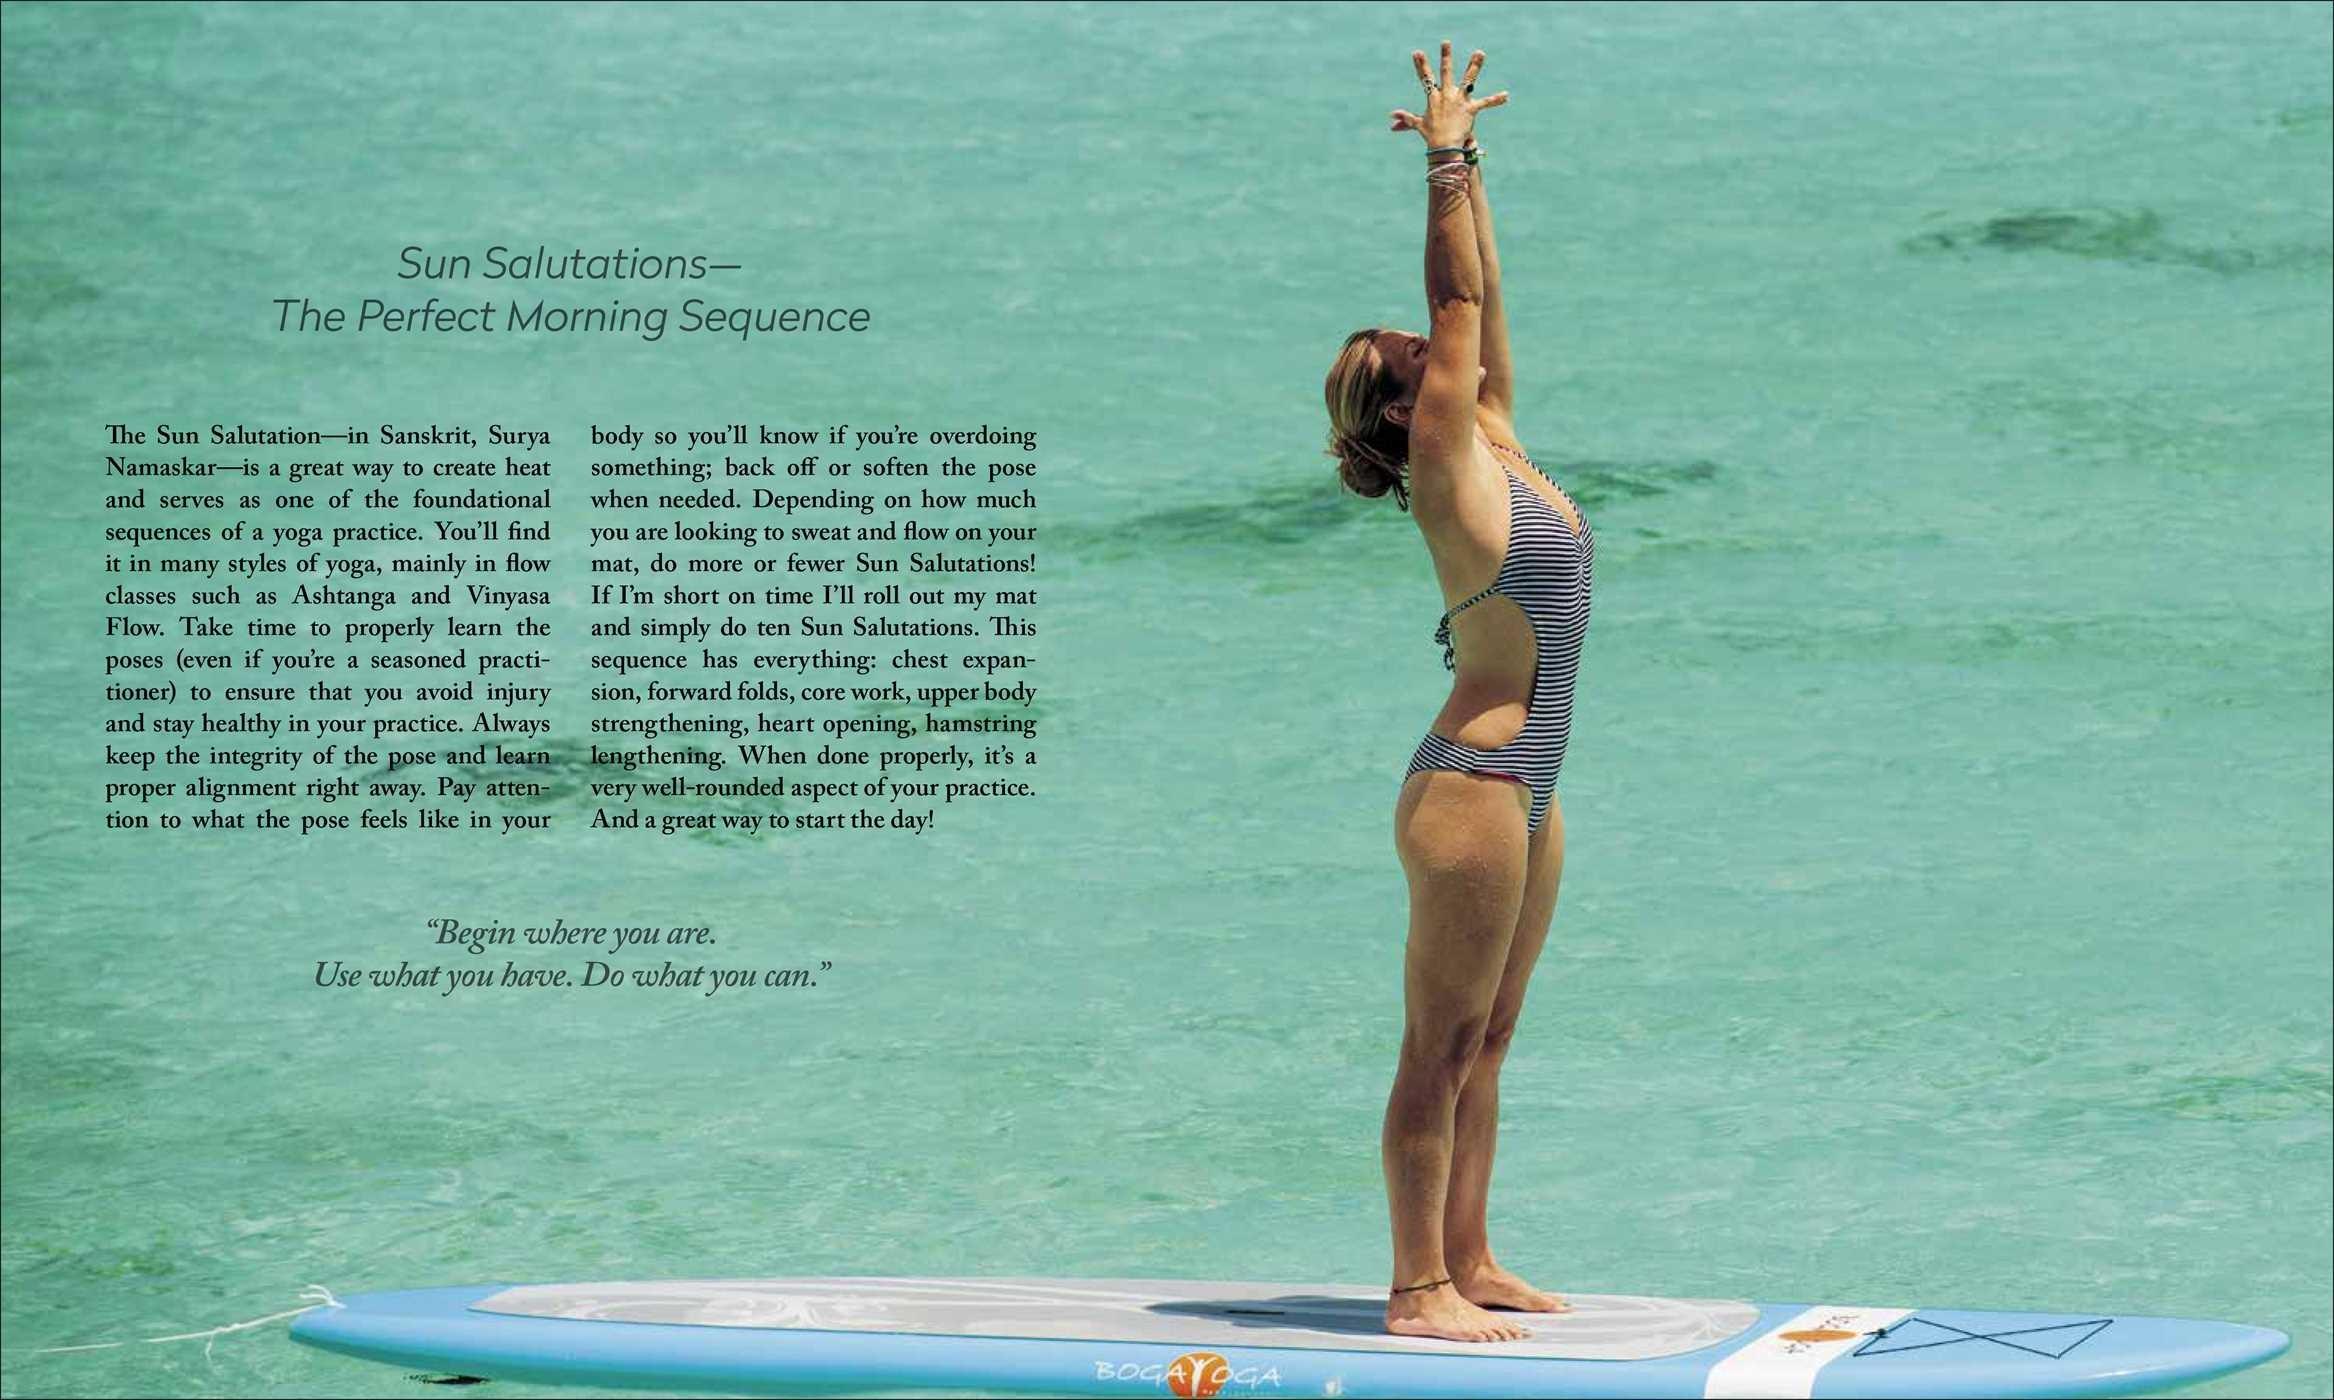 Yoga girl 9781501106767.in05